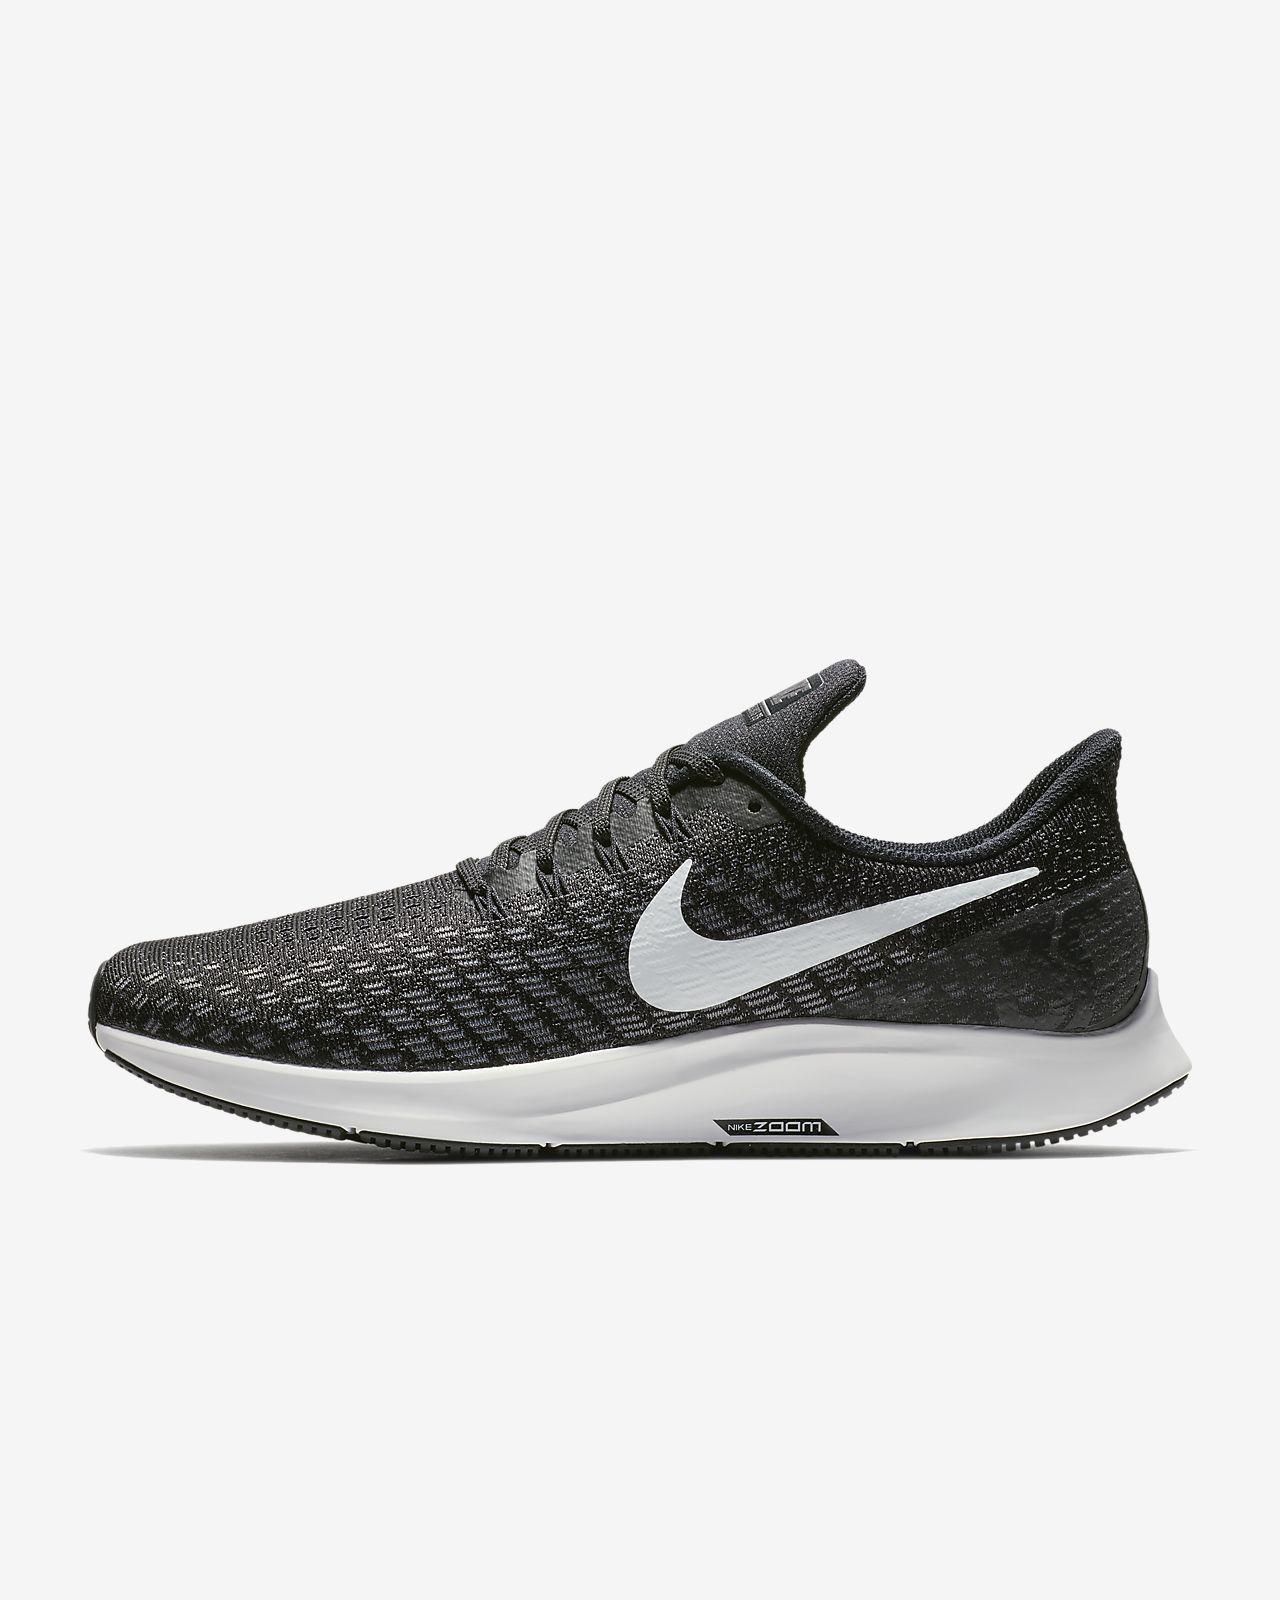 hot sale online 02d5a 005b7 ... Löparsko Nike Air Zoom Pegasus 35 för män